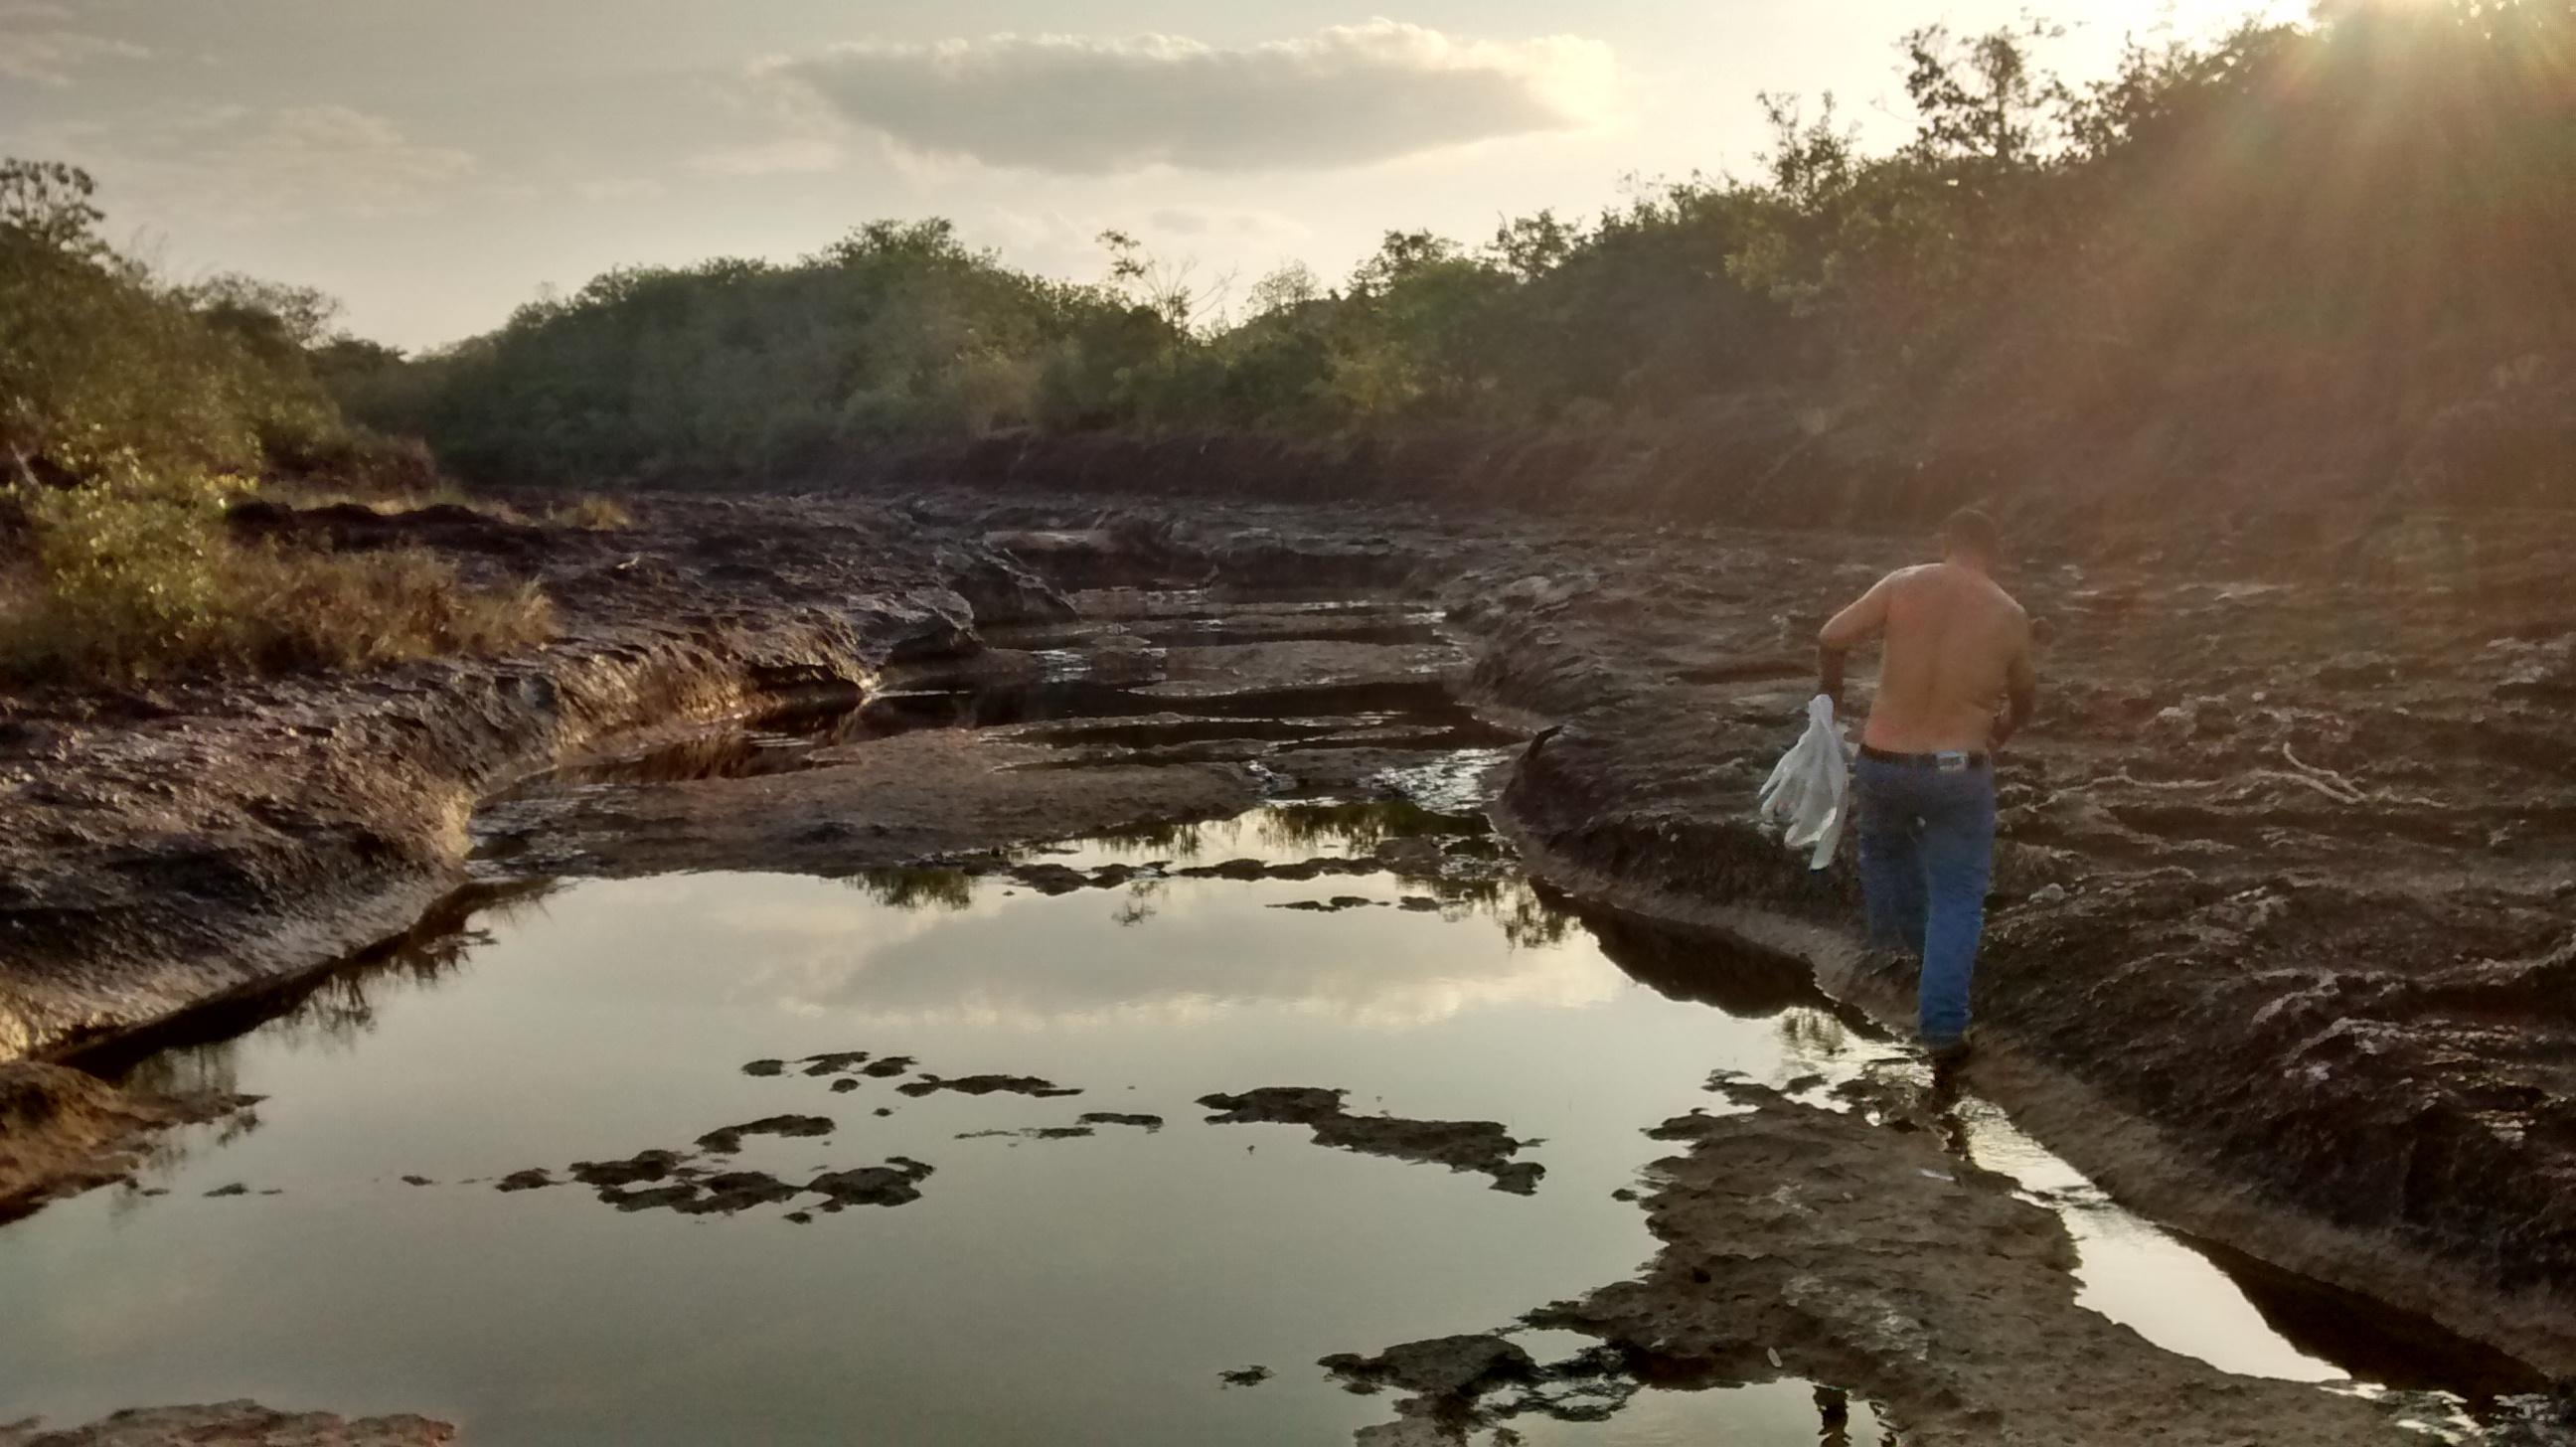 Pozos Naturales, Guaviare department, Colombia